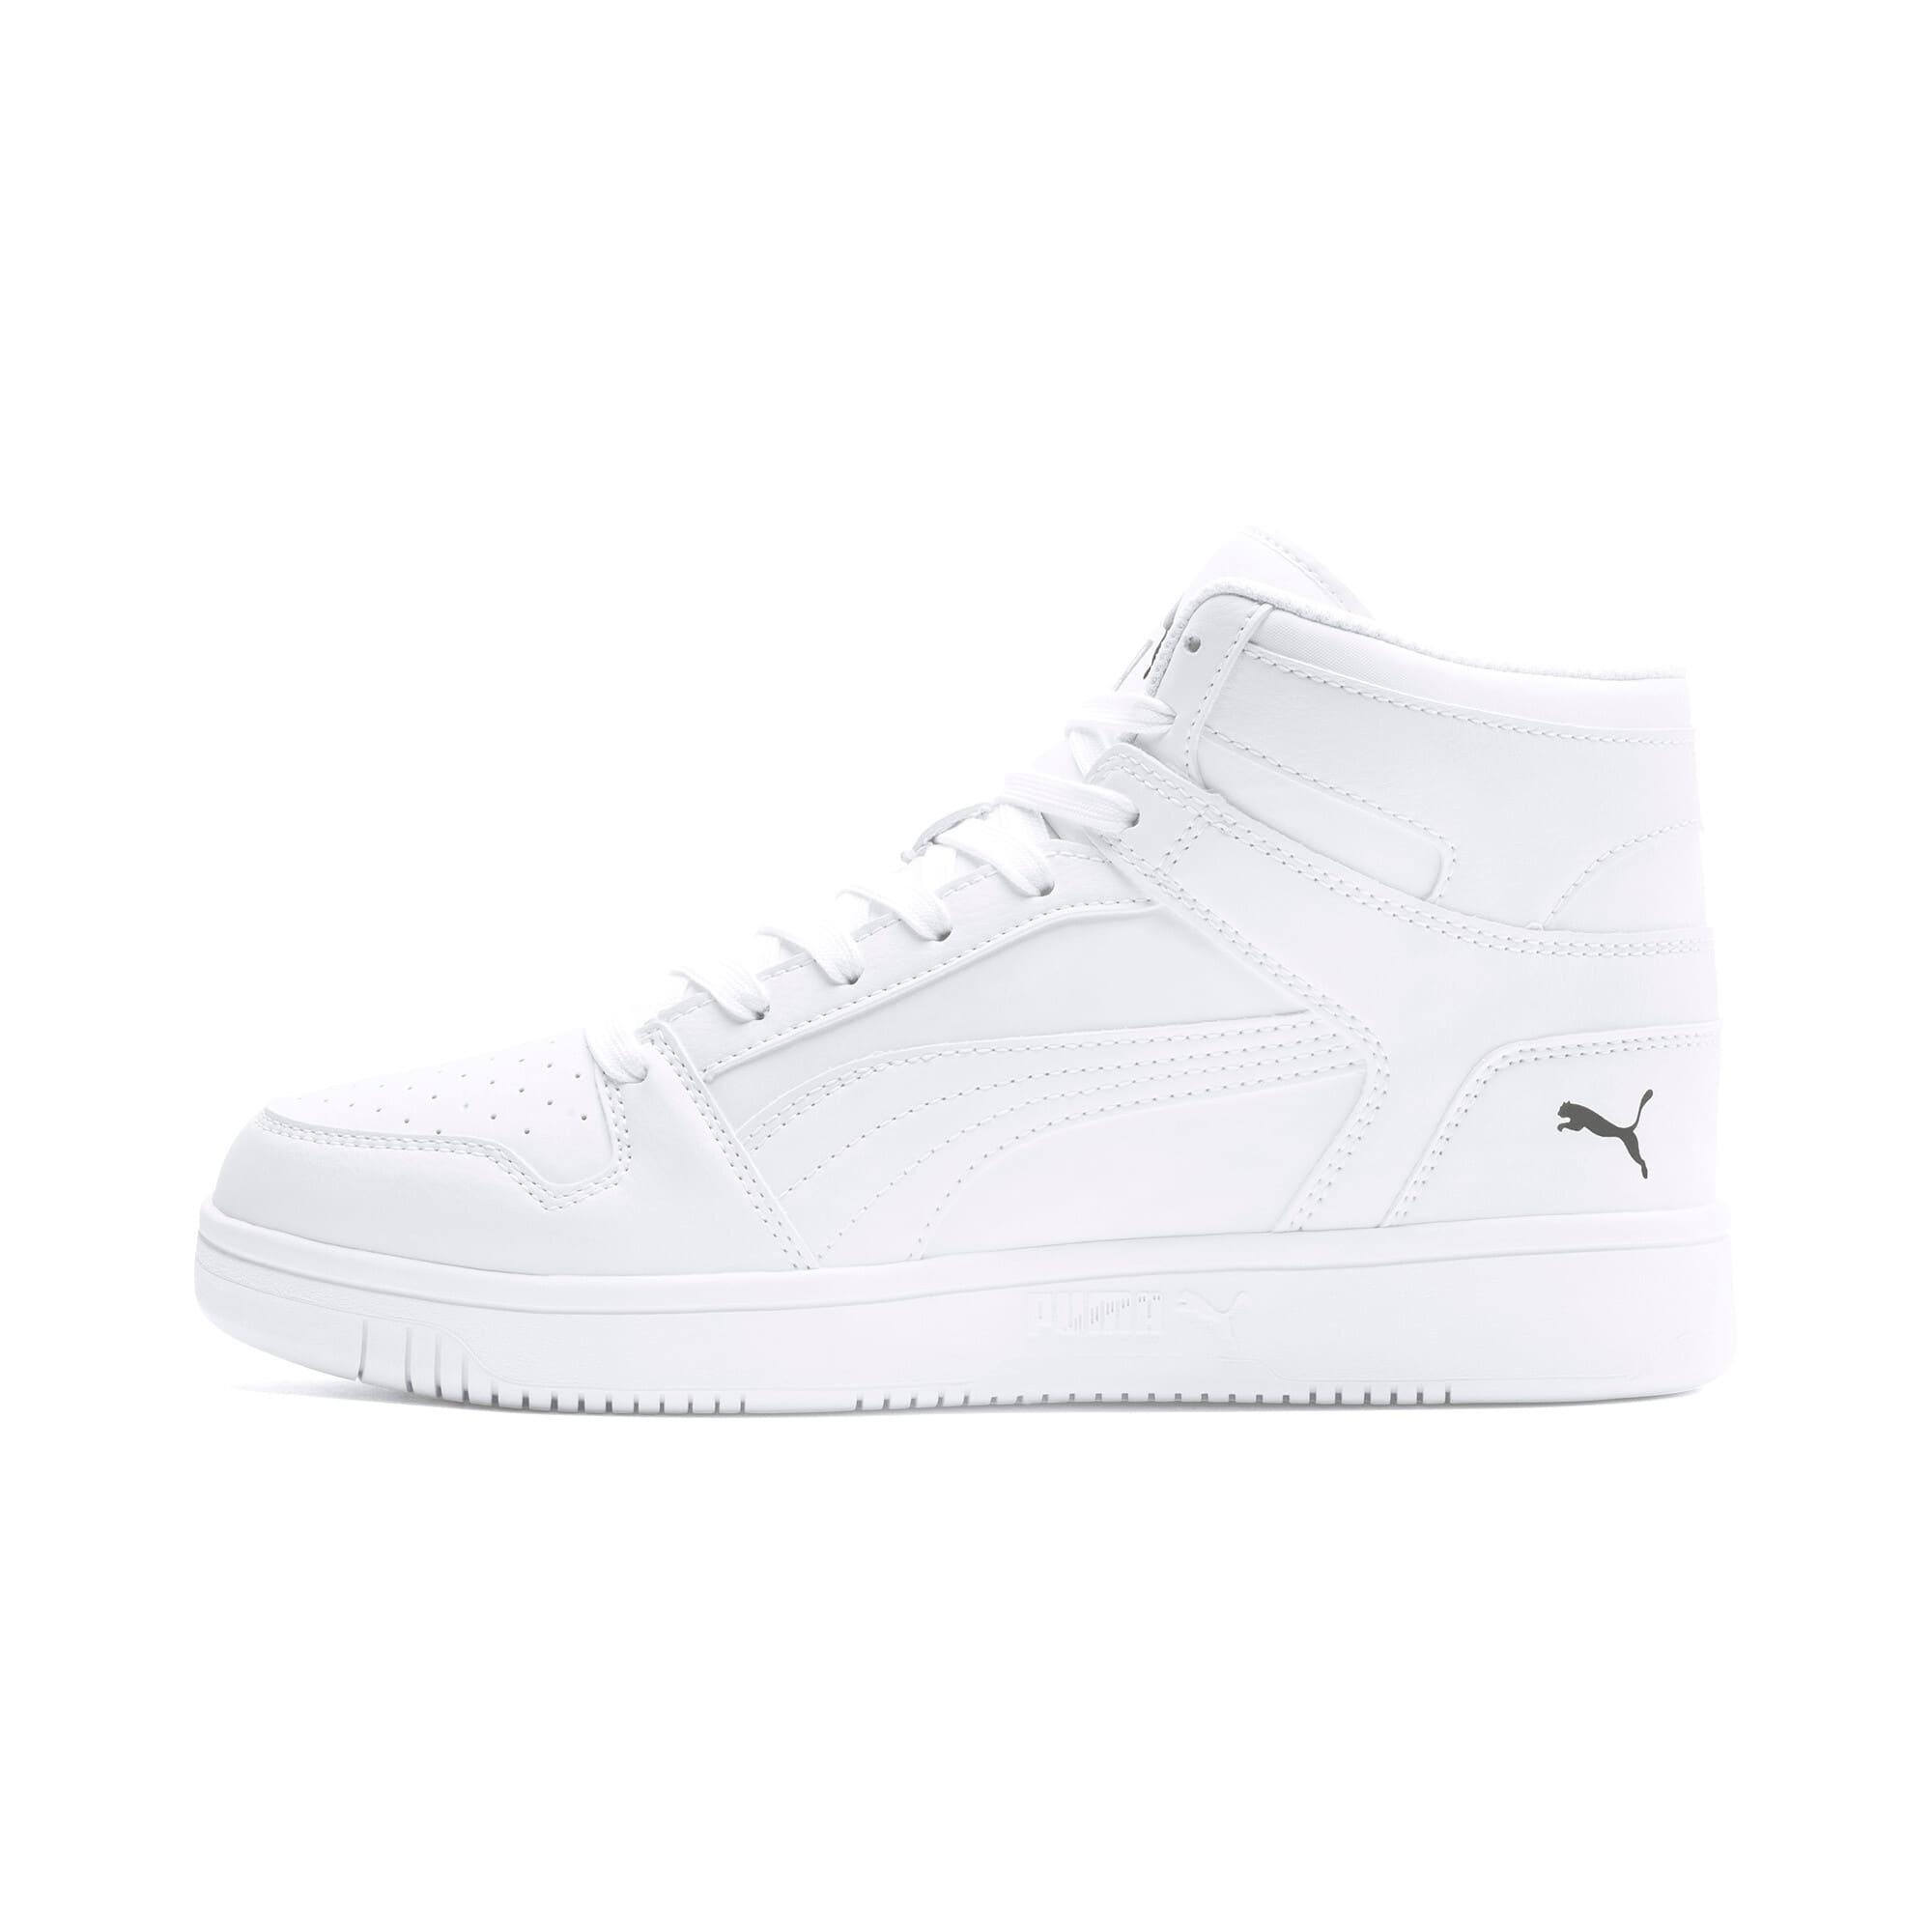 Thumbnail 1 of PUMA Rebound LayUp Sneakers, Puma White-Puma Black, medium